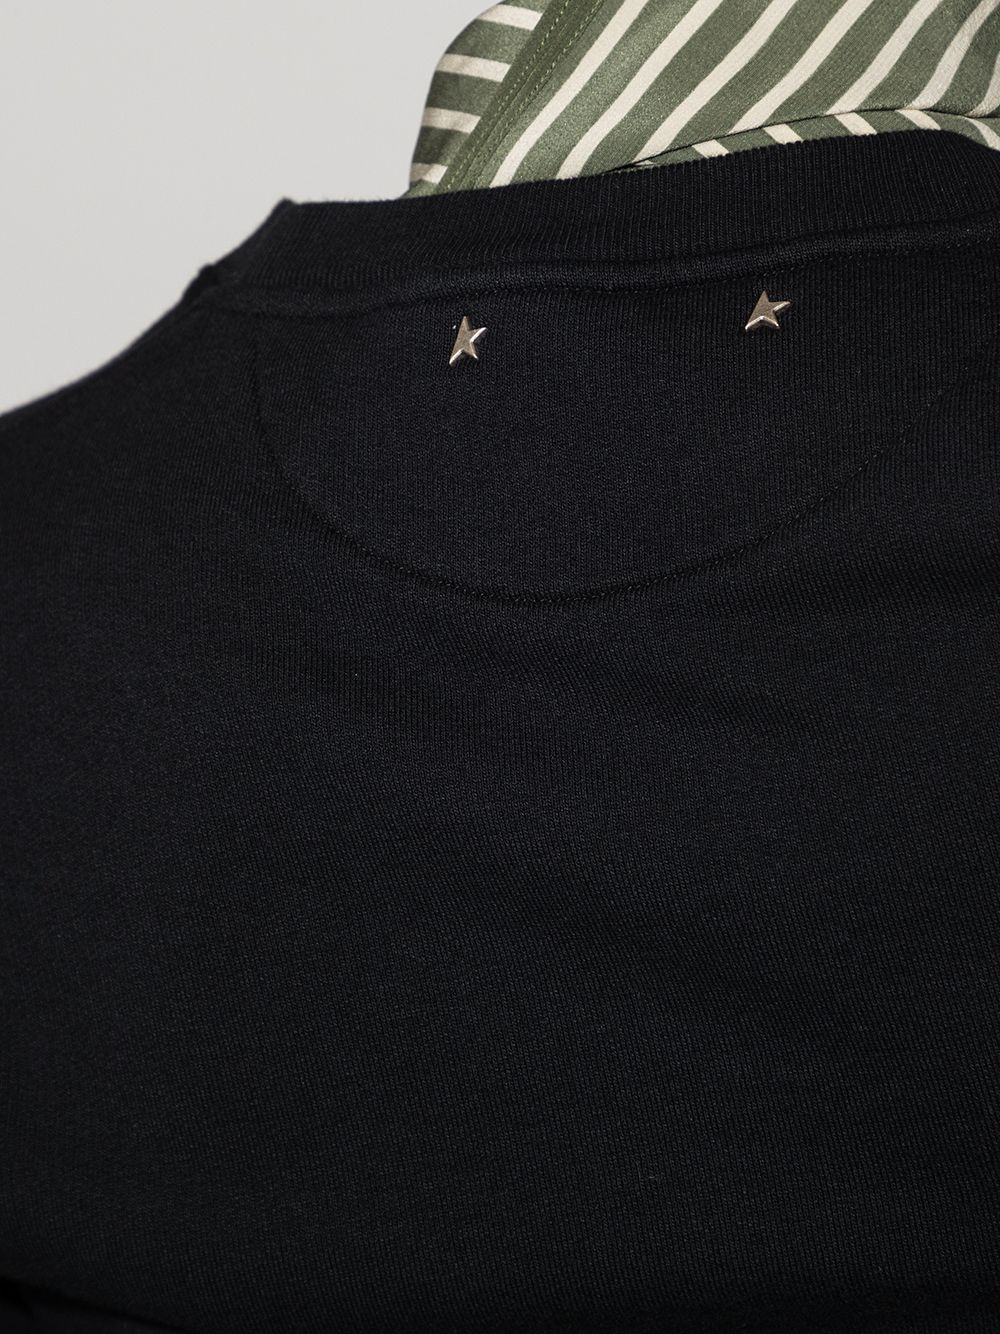 Picture of Golden Goose Deluxe Brand   Athena Logo-Print Sweatshirt